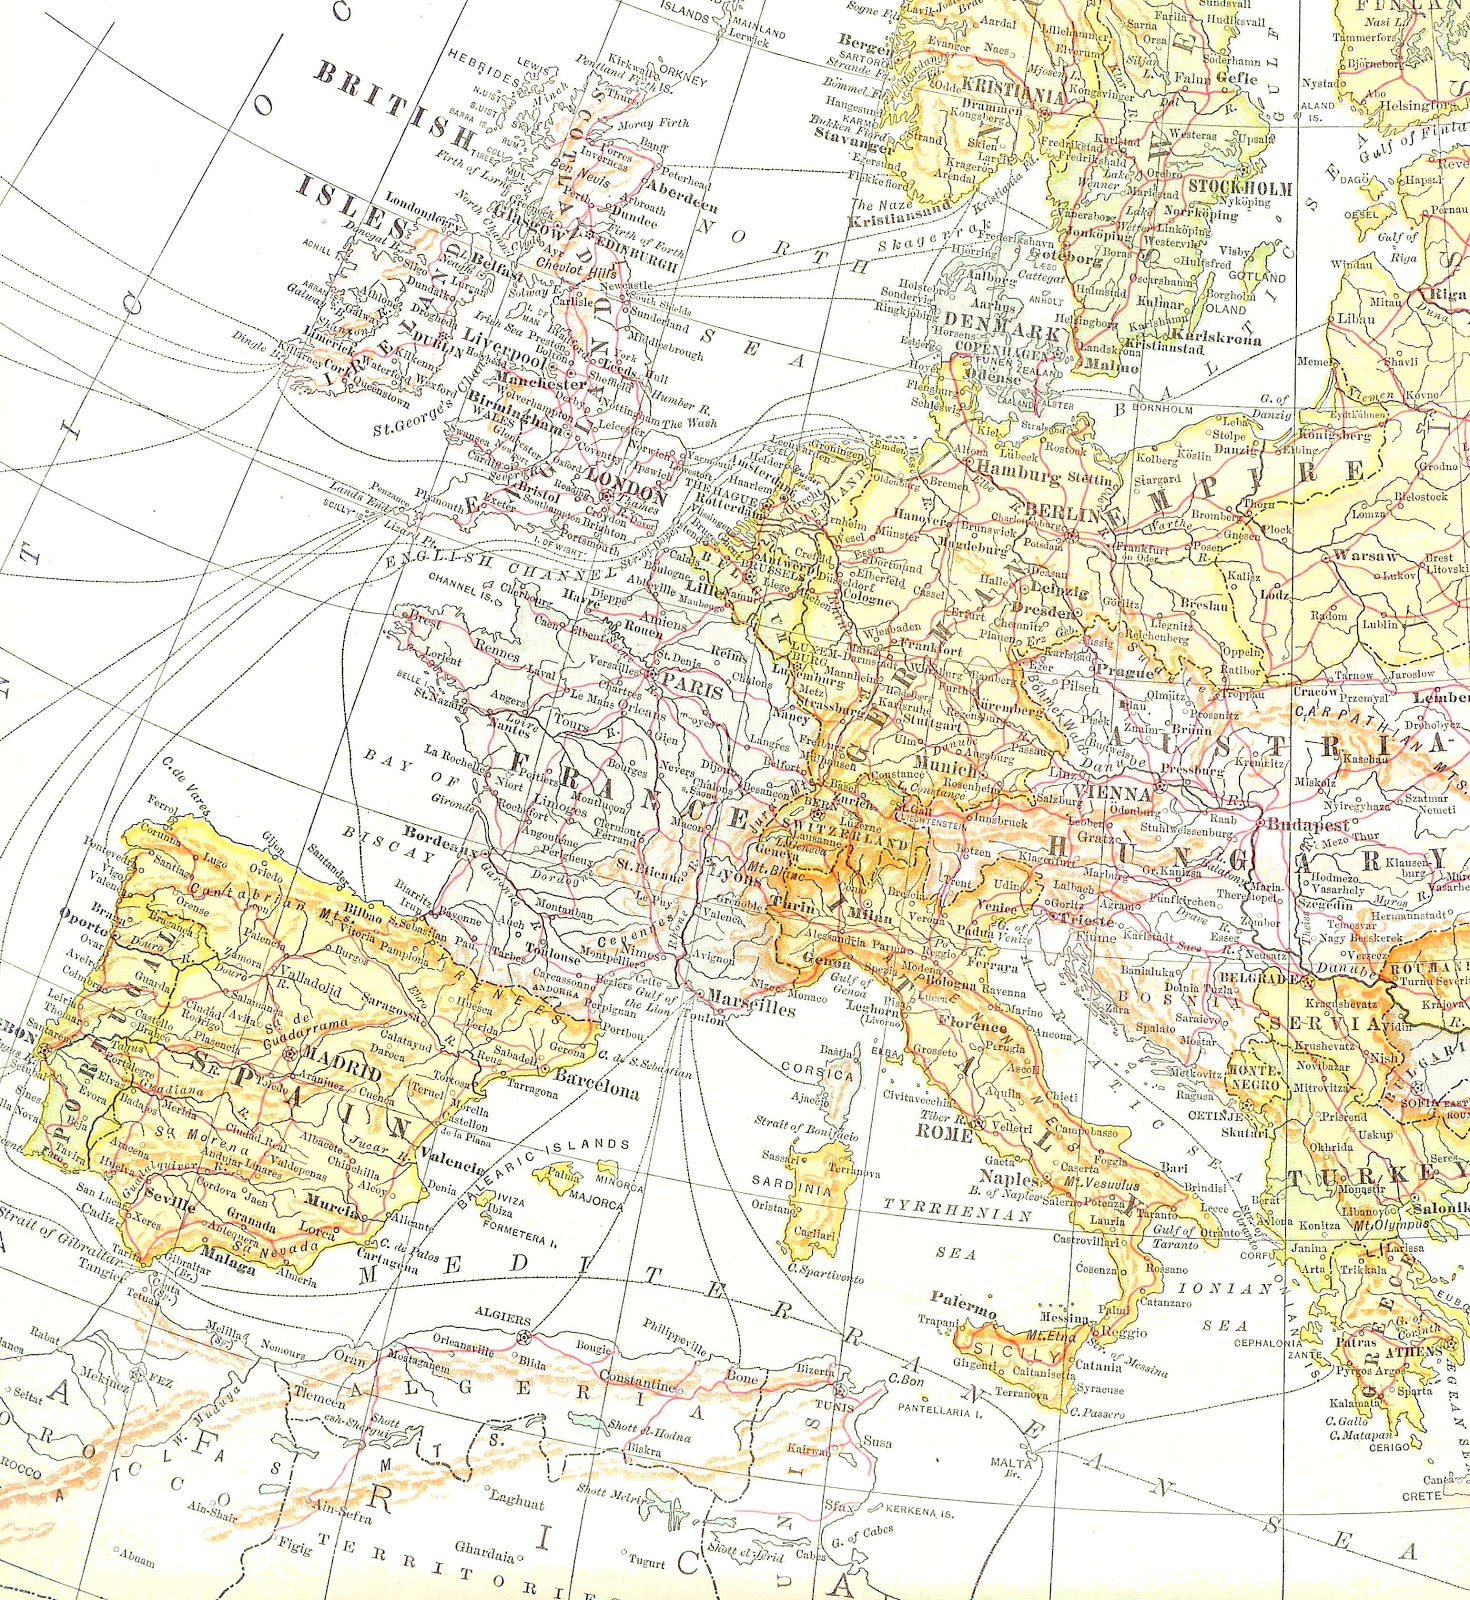 antique images free vintage clip art of map vintage map how to make cliparts how to make clipart procreate